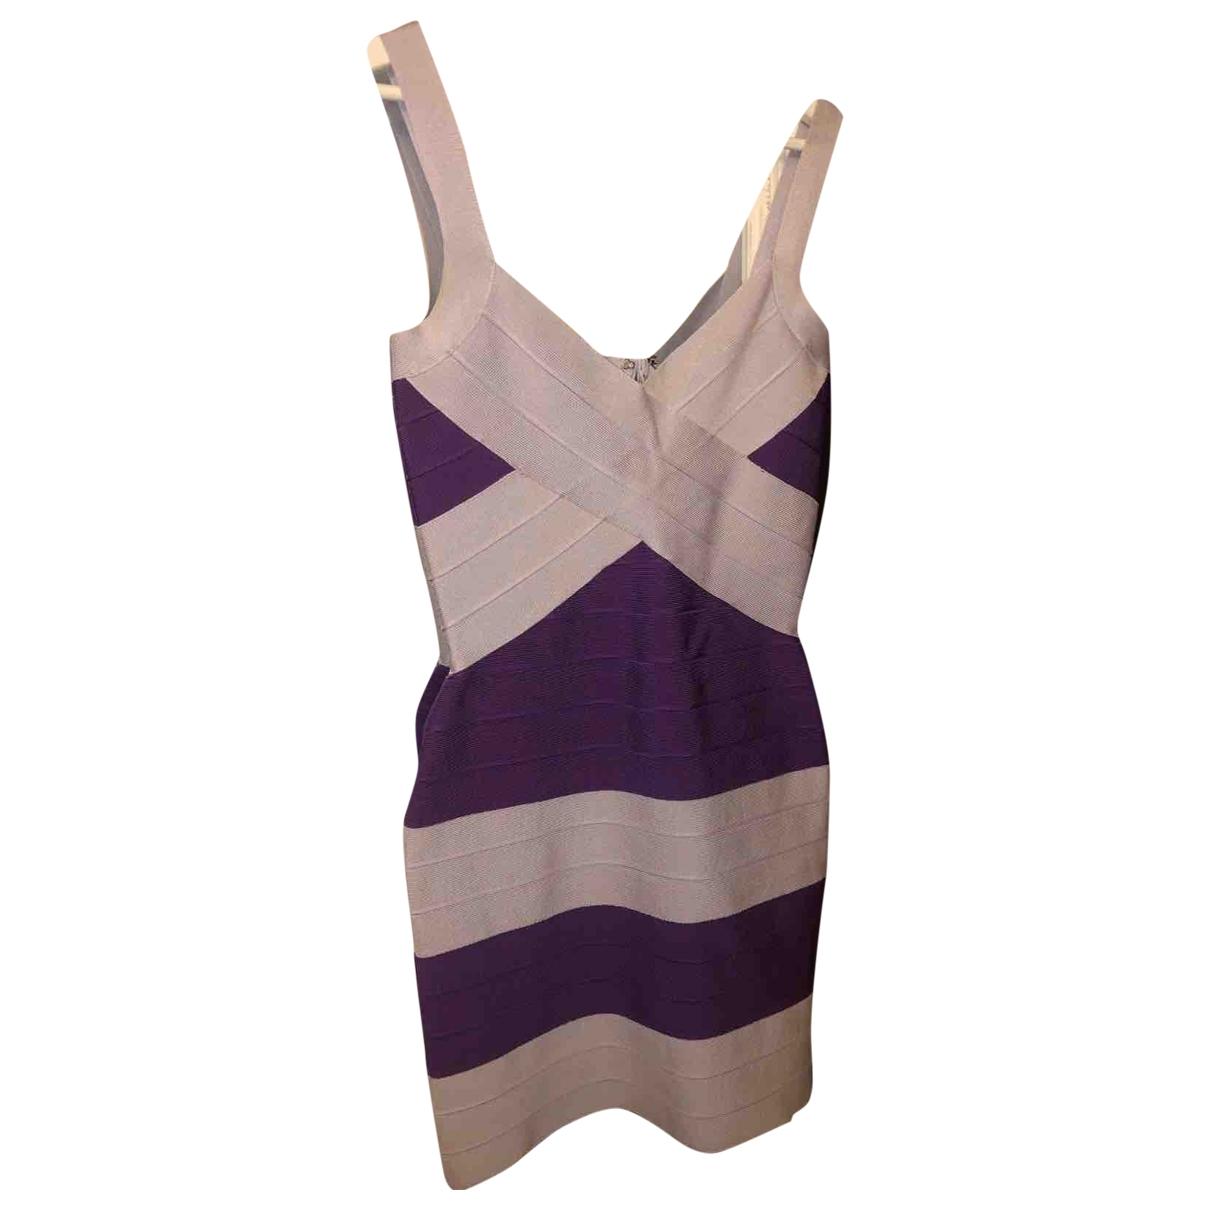 Herve Leger - Robe   pour femme en coton - elasthane - violet